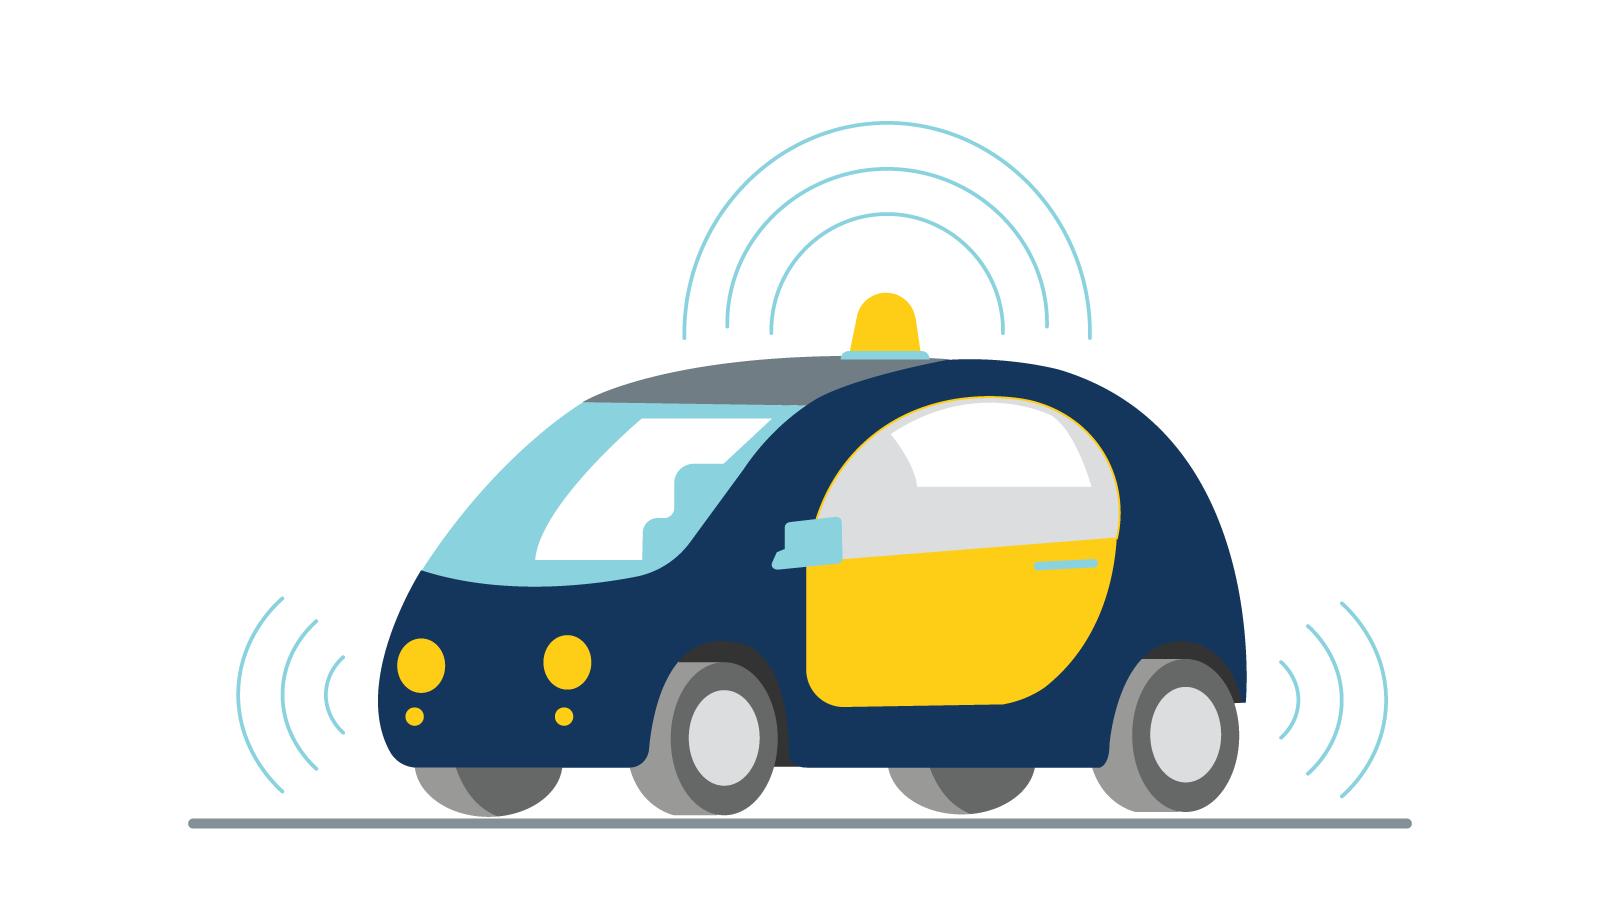 Illustration of car transmitting connecting signals.